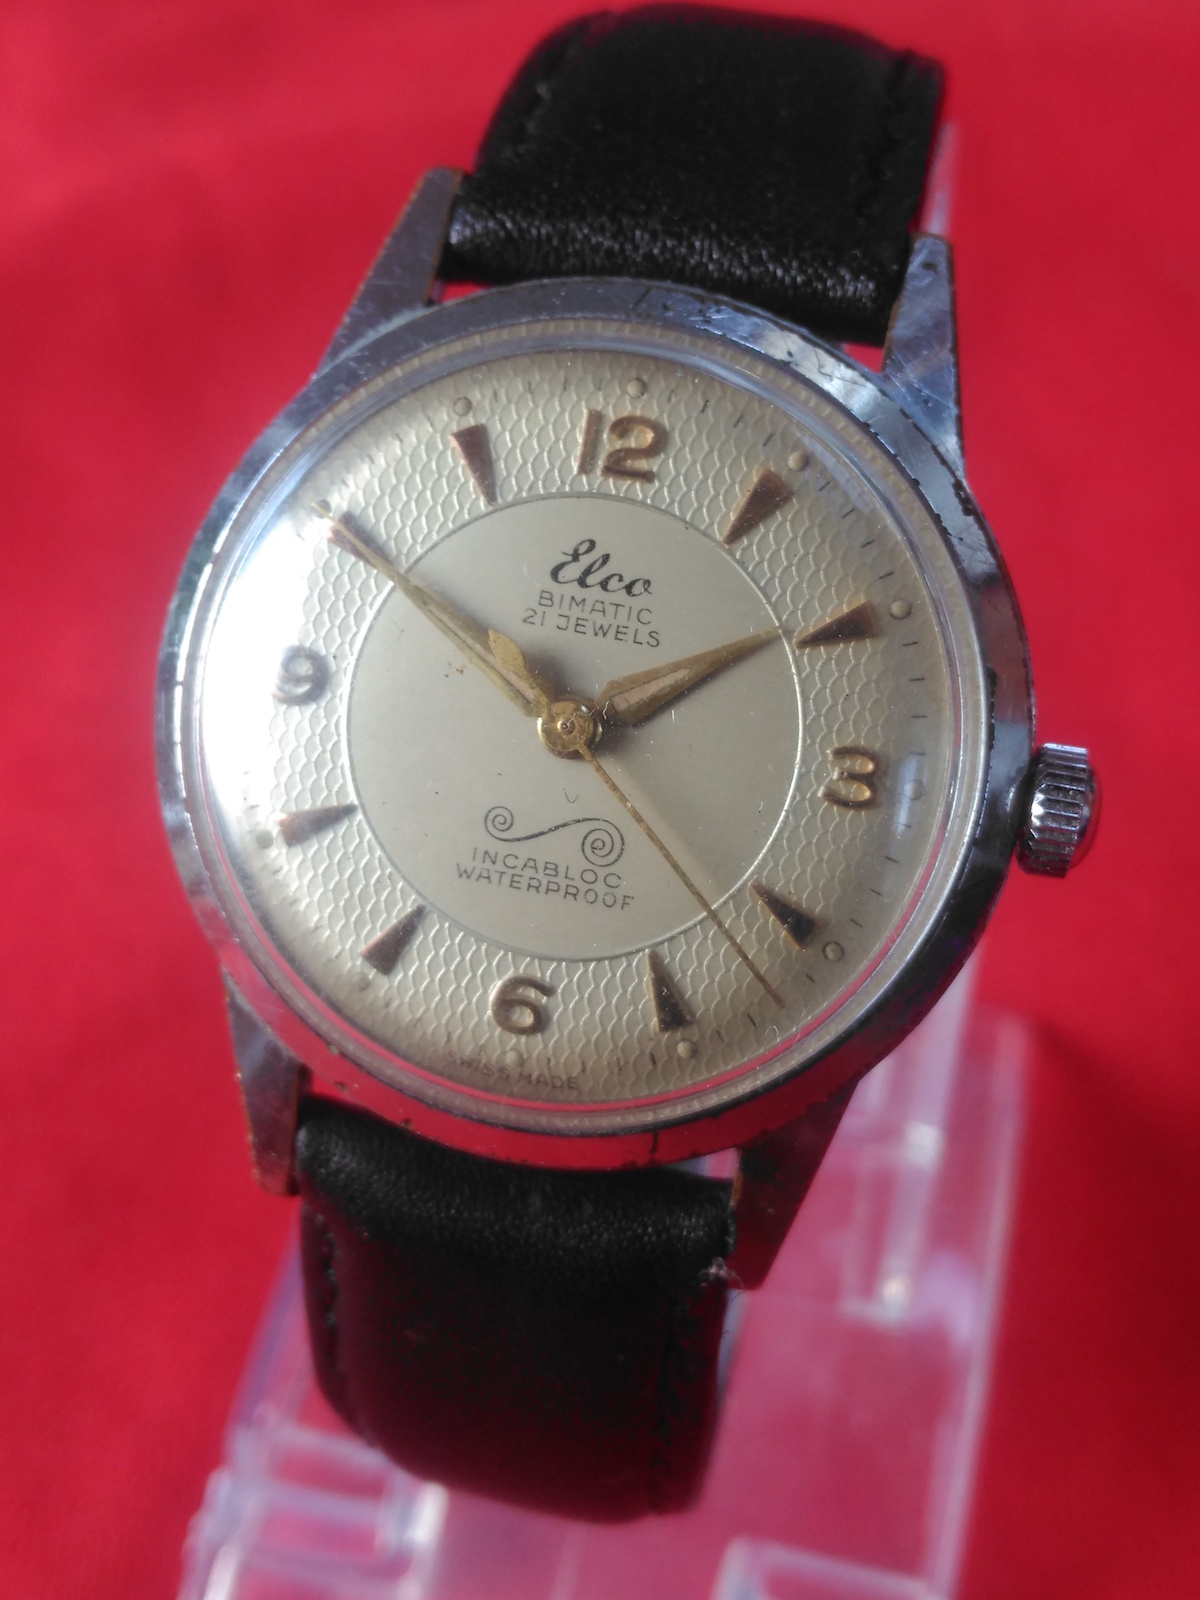 Vintage Elco Swiss made manual wind mechanical wrist watch